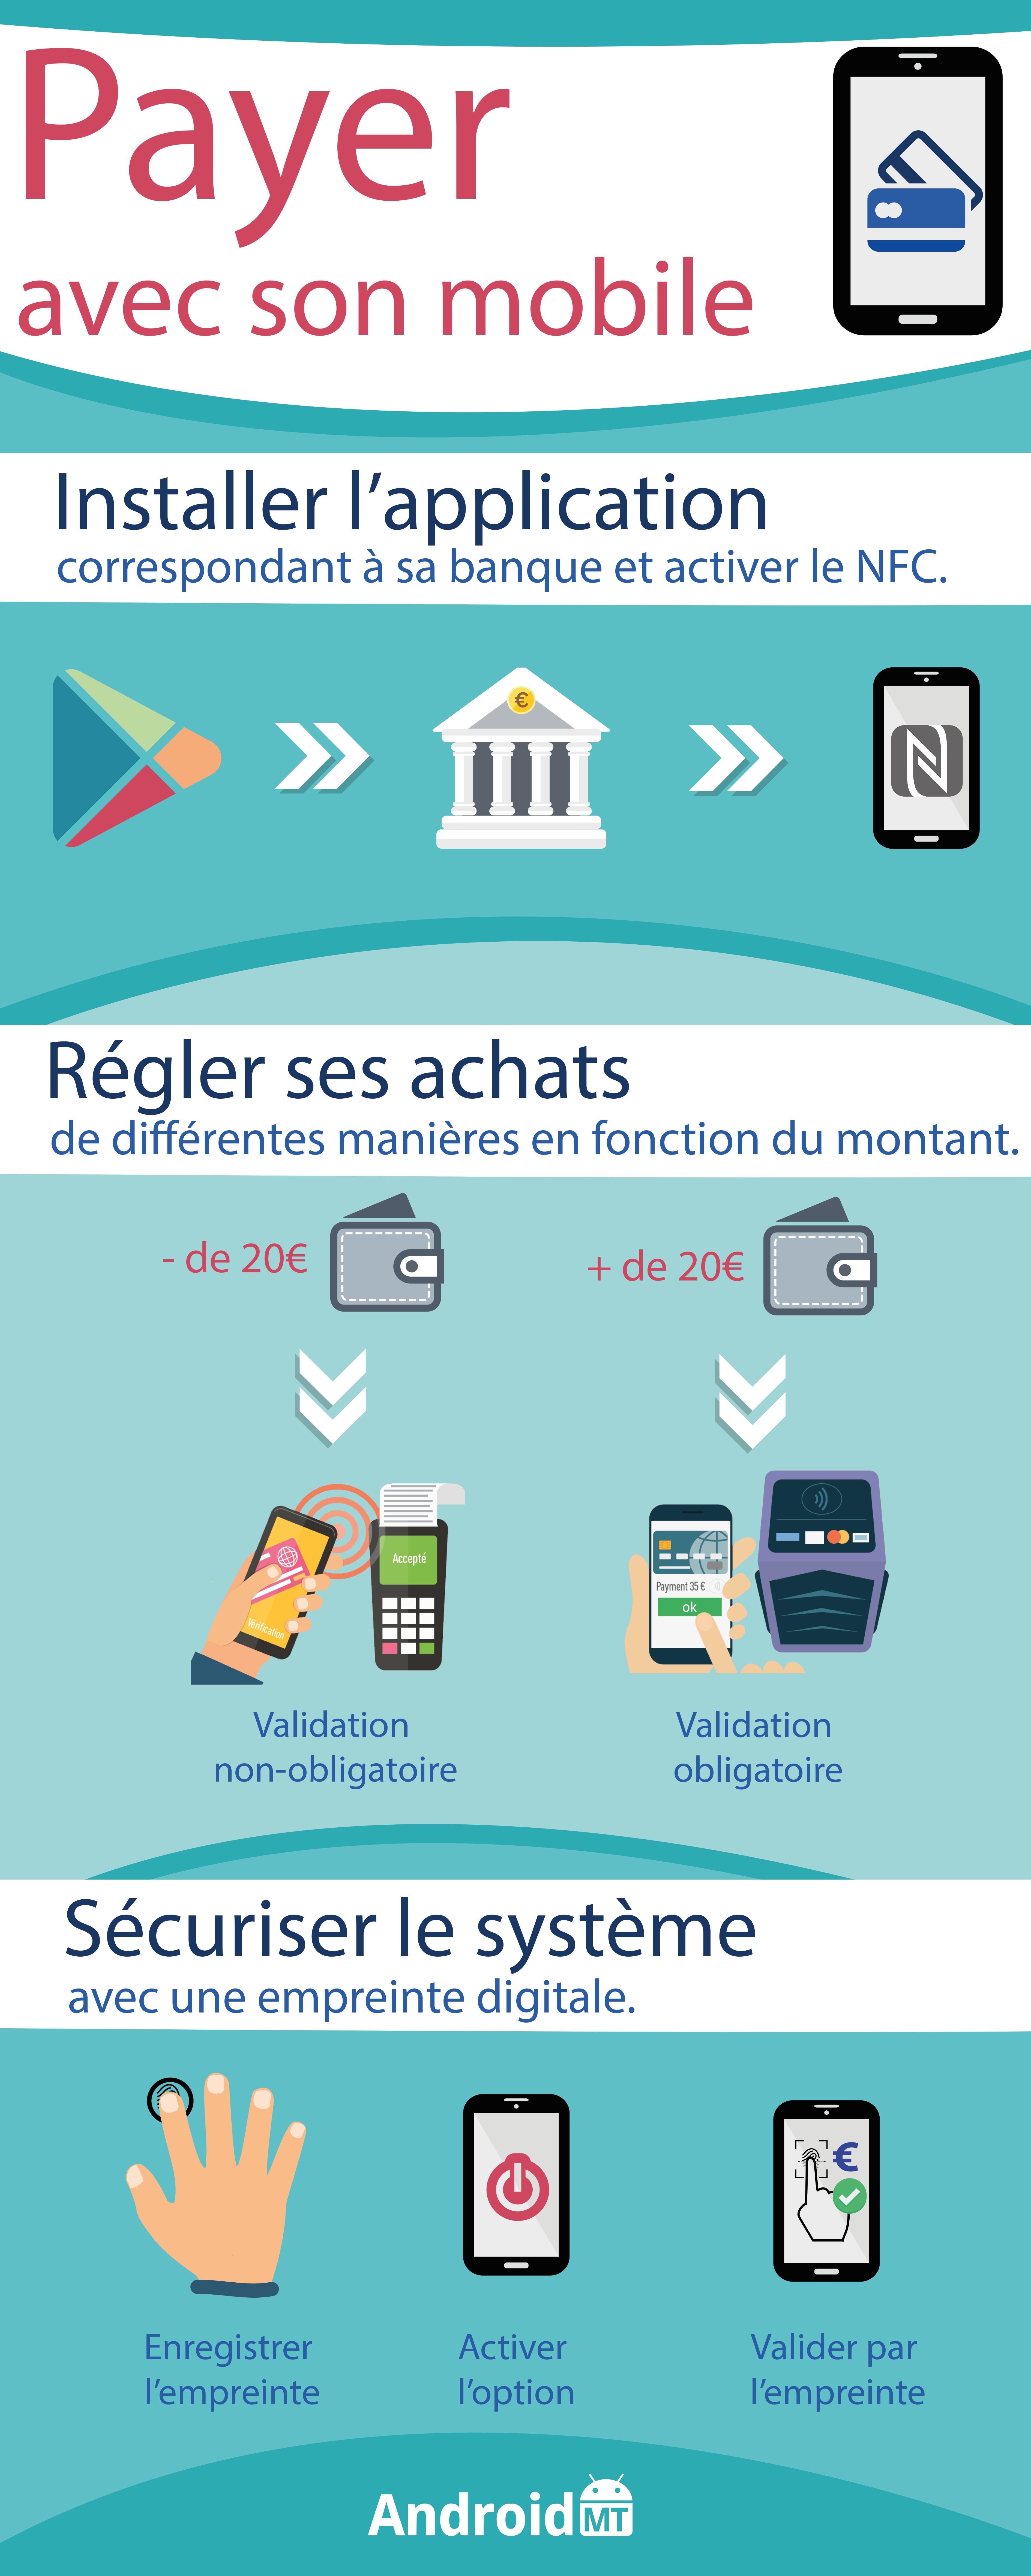 Magazine infographie payer avec son mobile android mt - Payer en plusieurs fois telephone portable ...